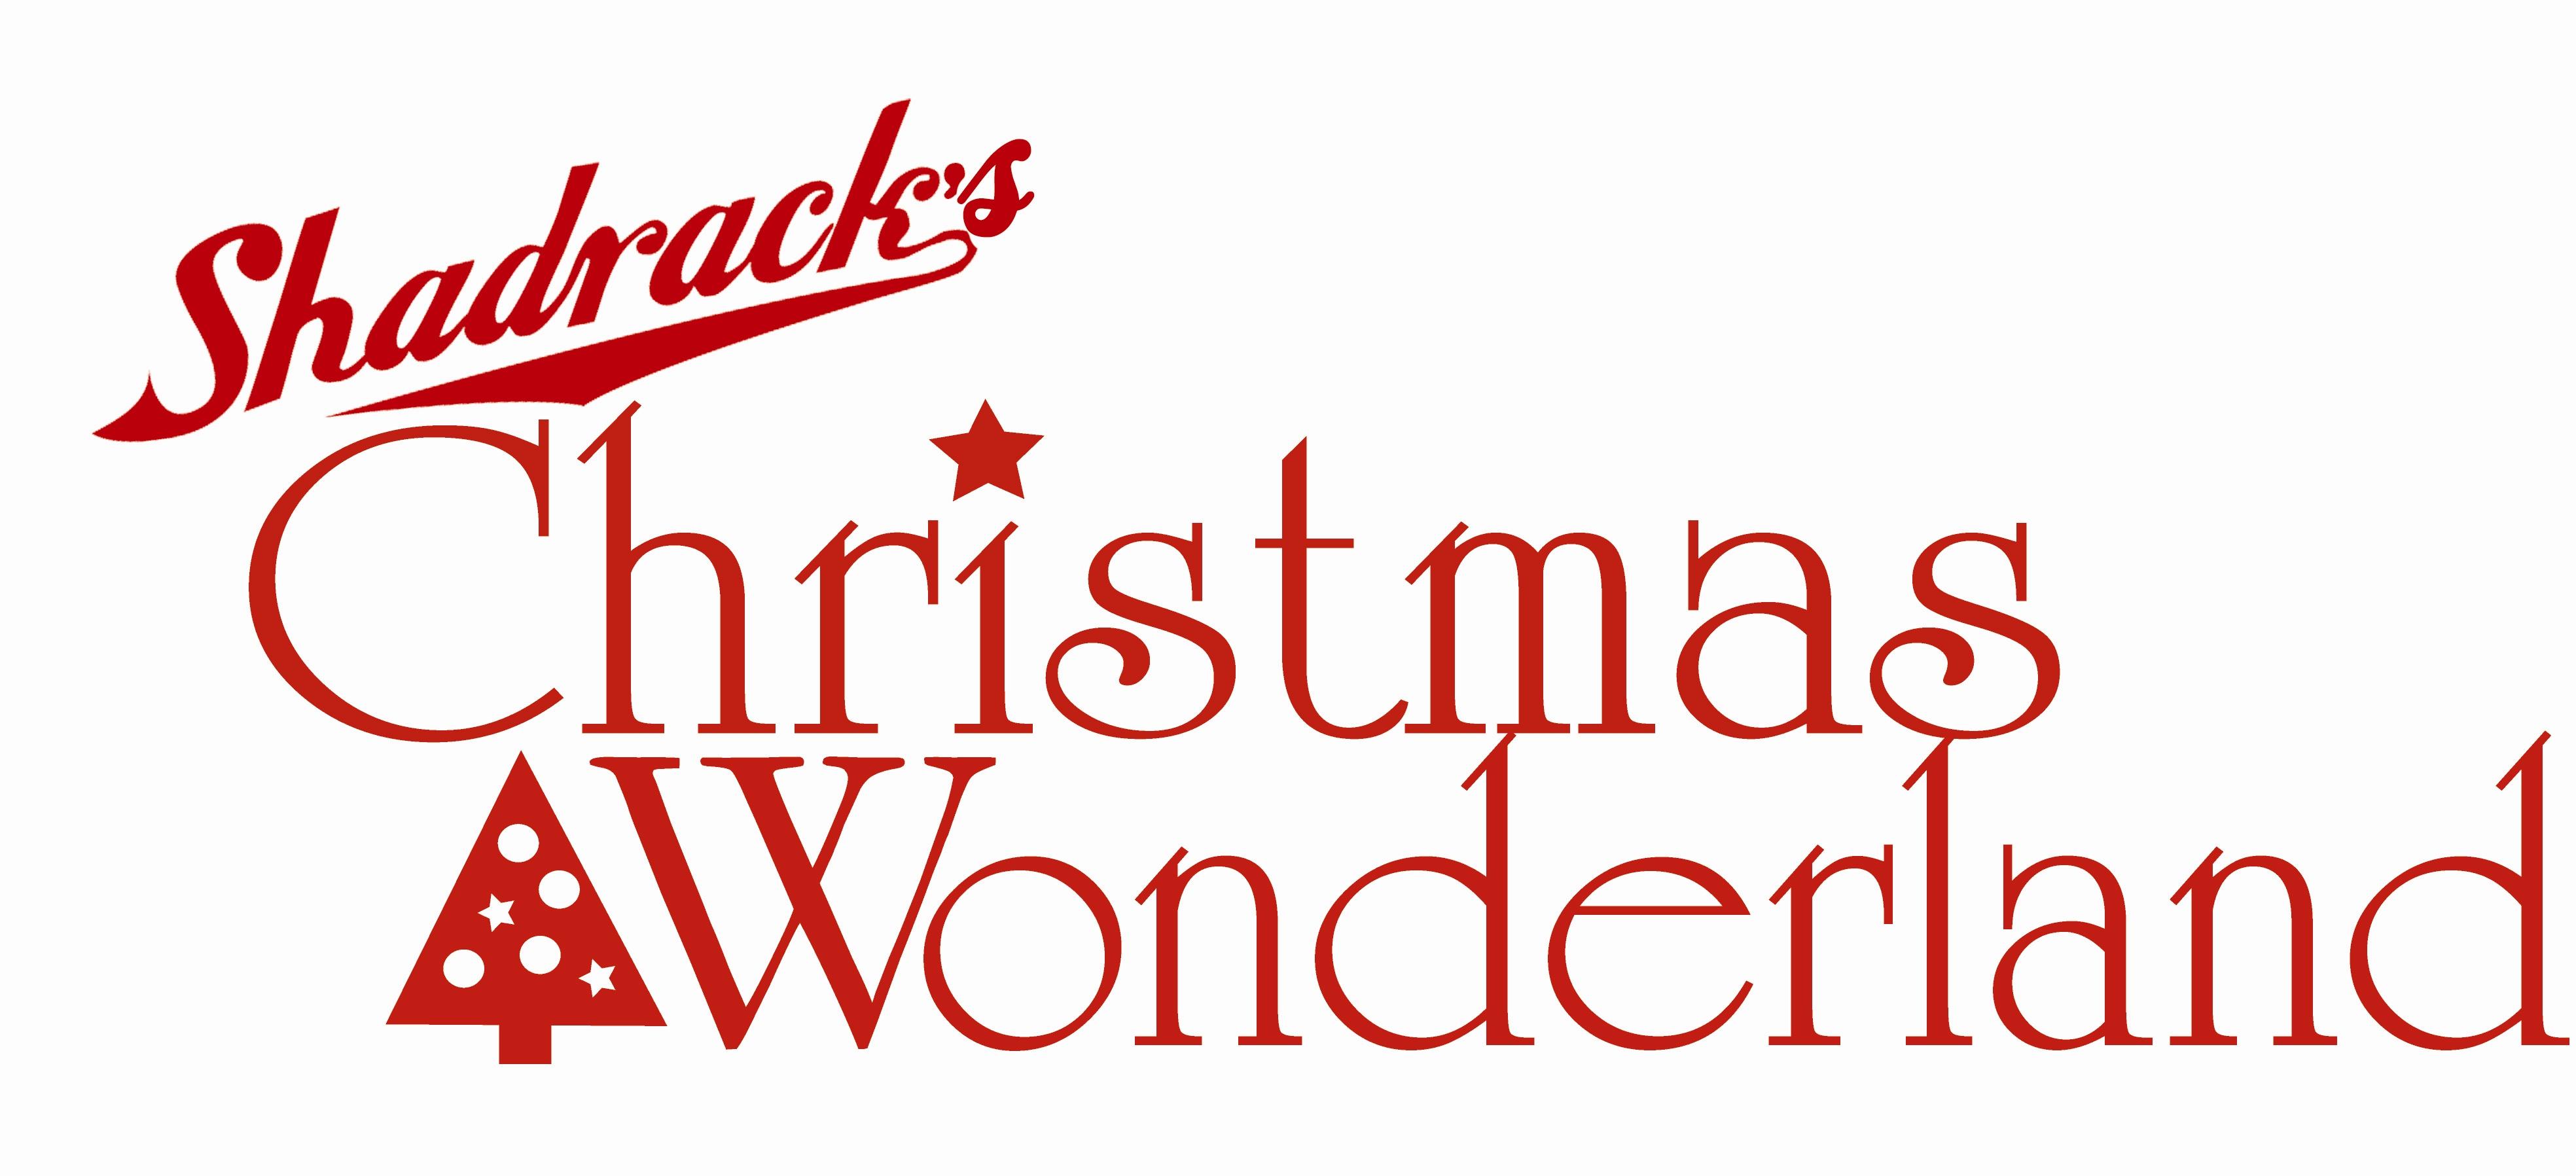 shadracks christmas wonderland returns to smokies stadium for another season of festive lights jolly tunes and santa himself